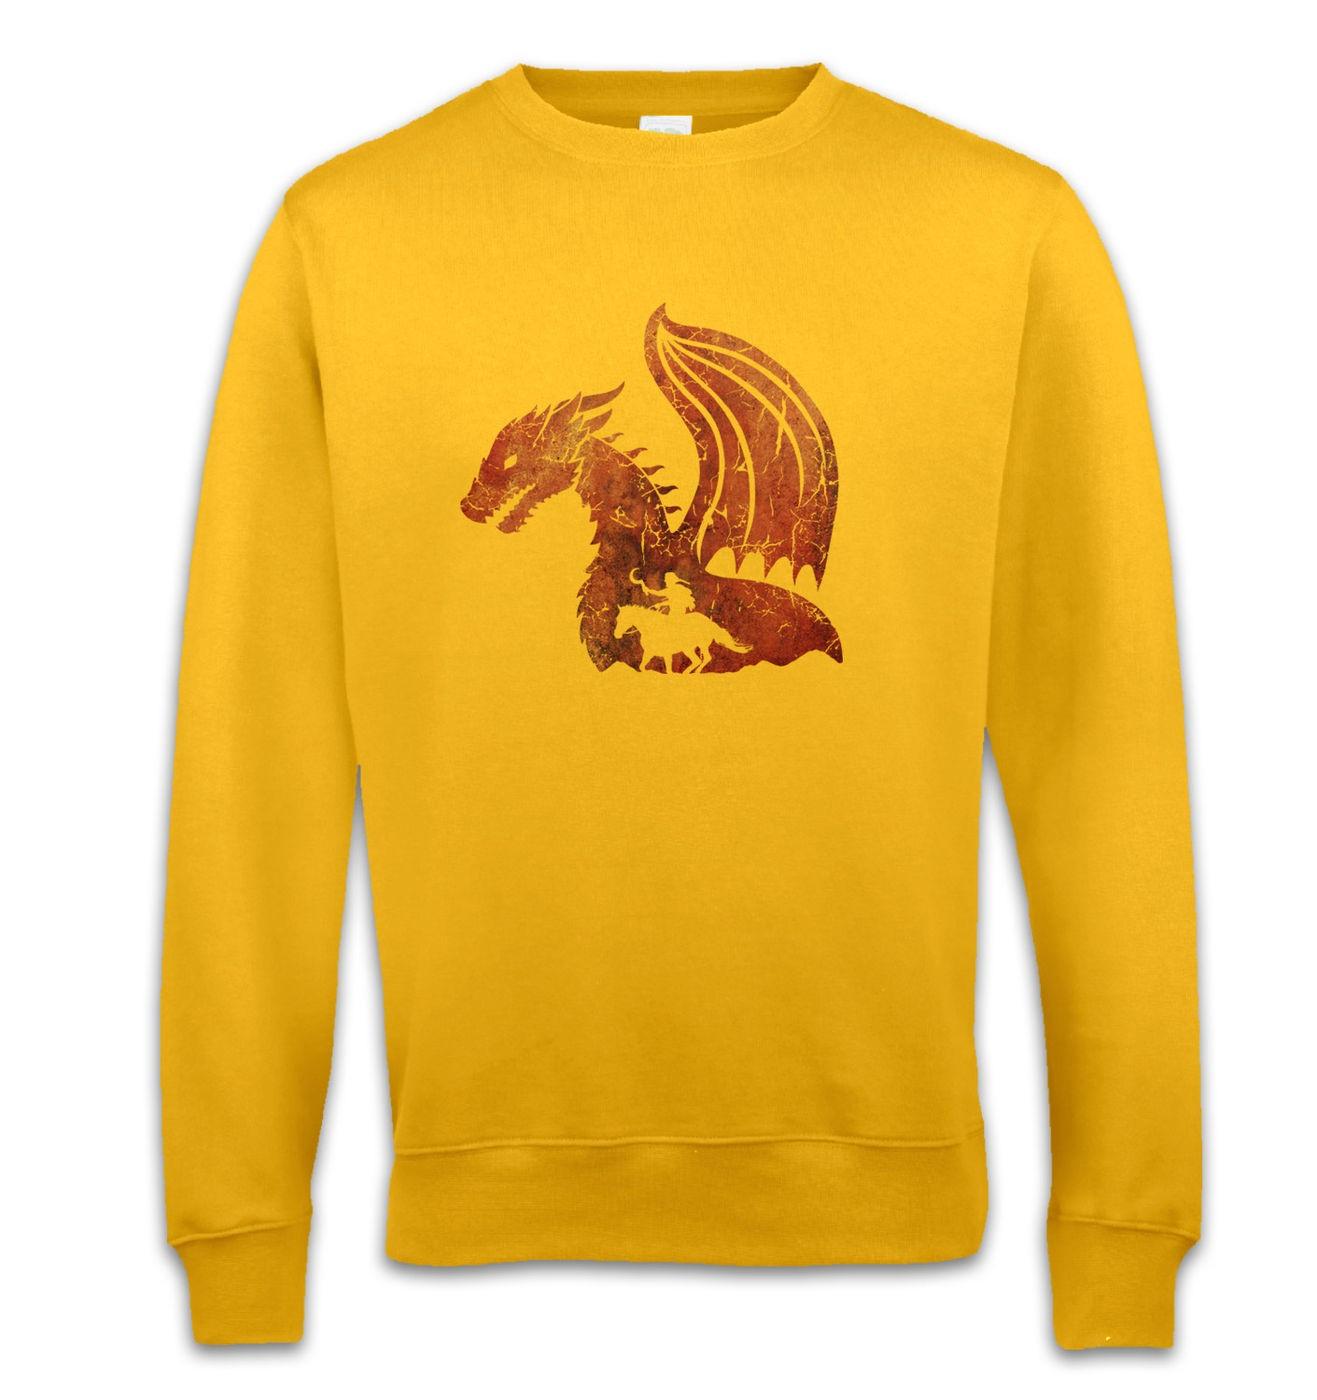 Field Of Fire sweatshirt by Something Geeky